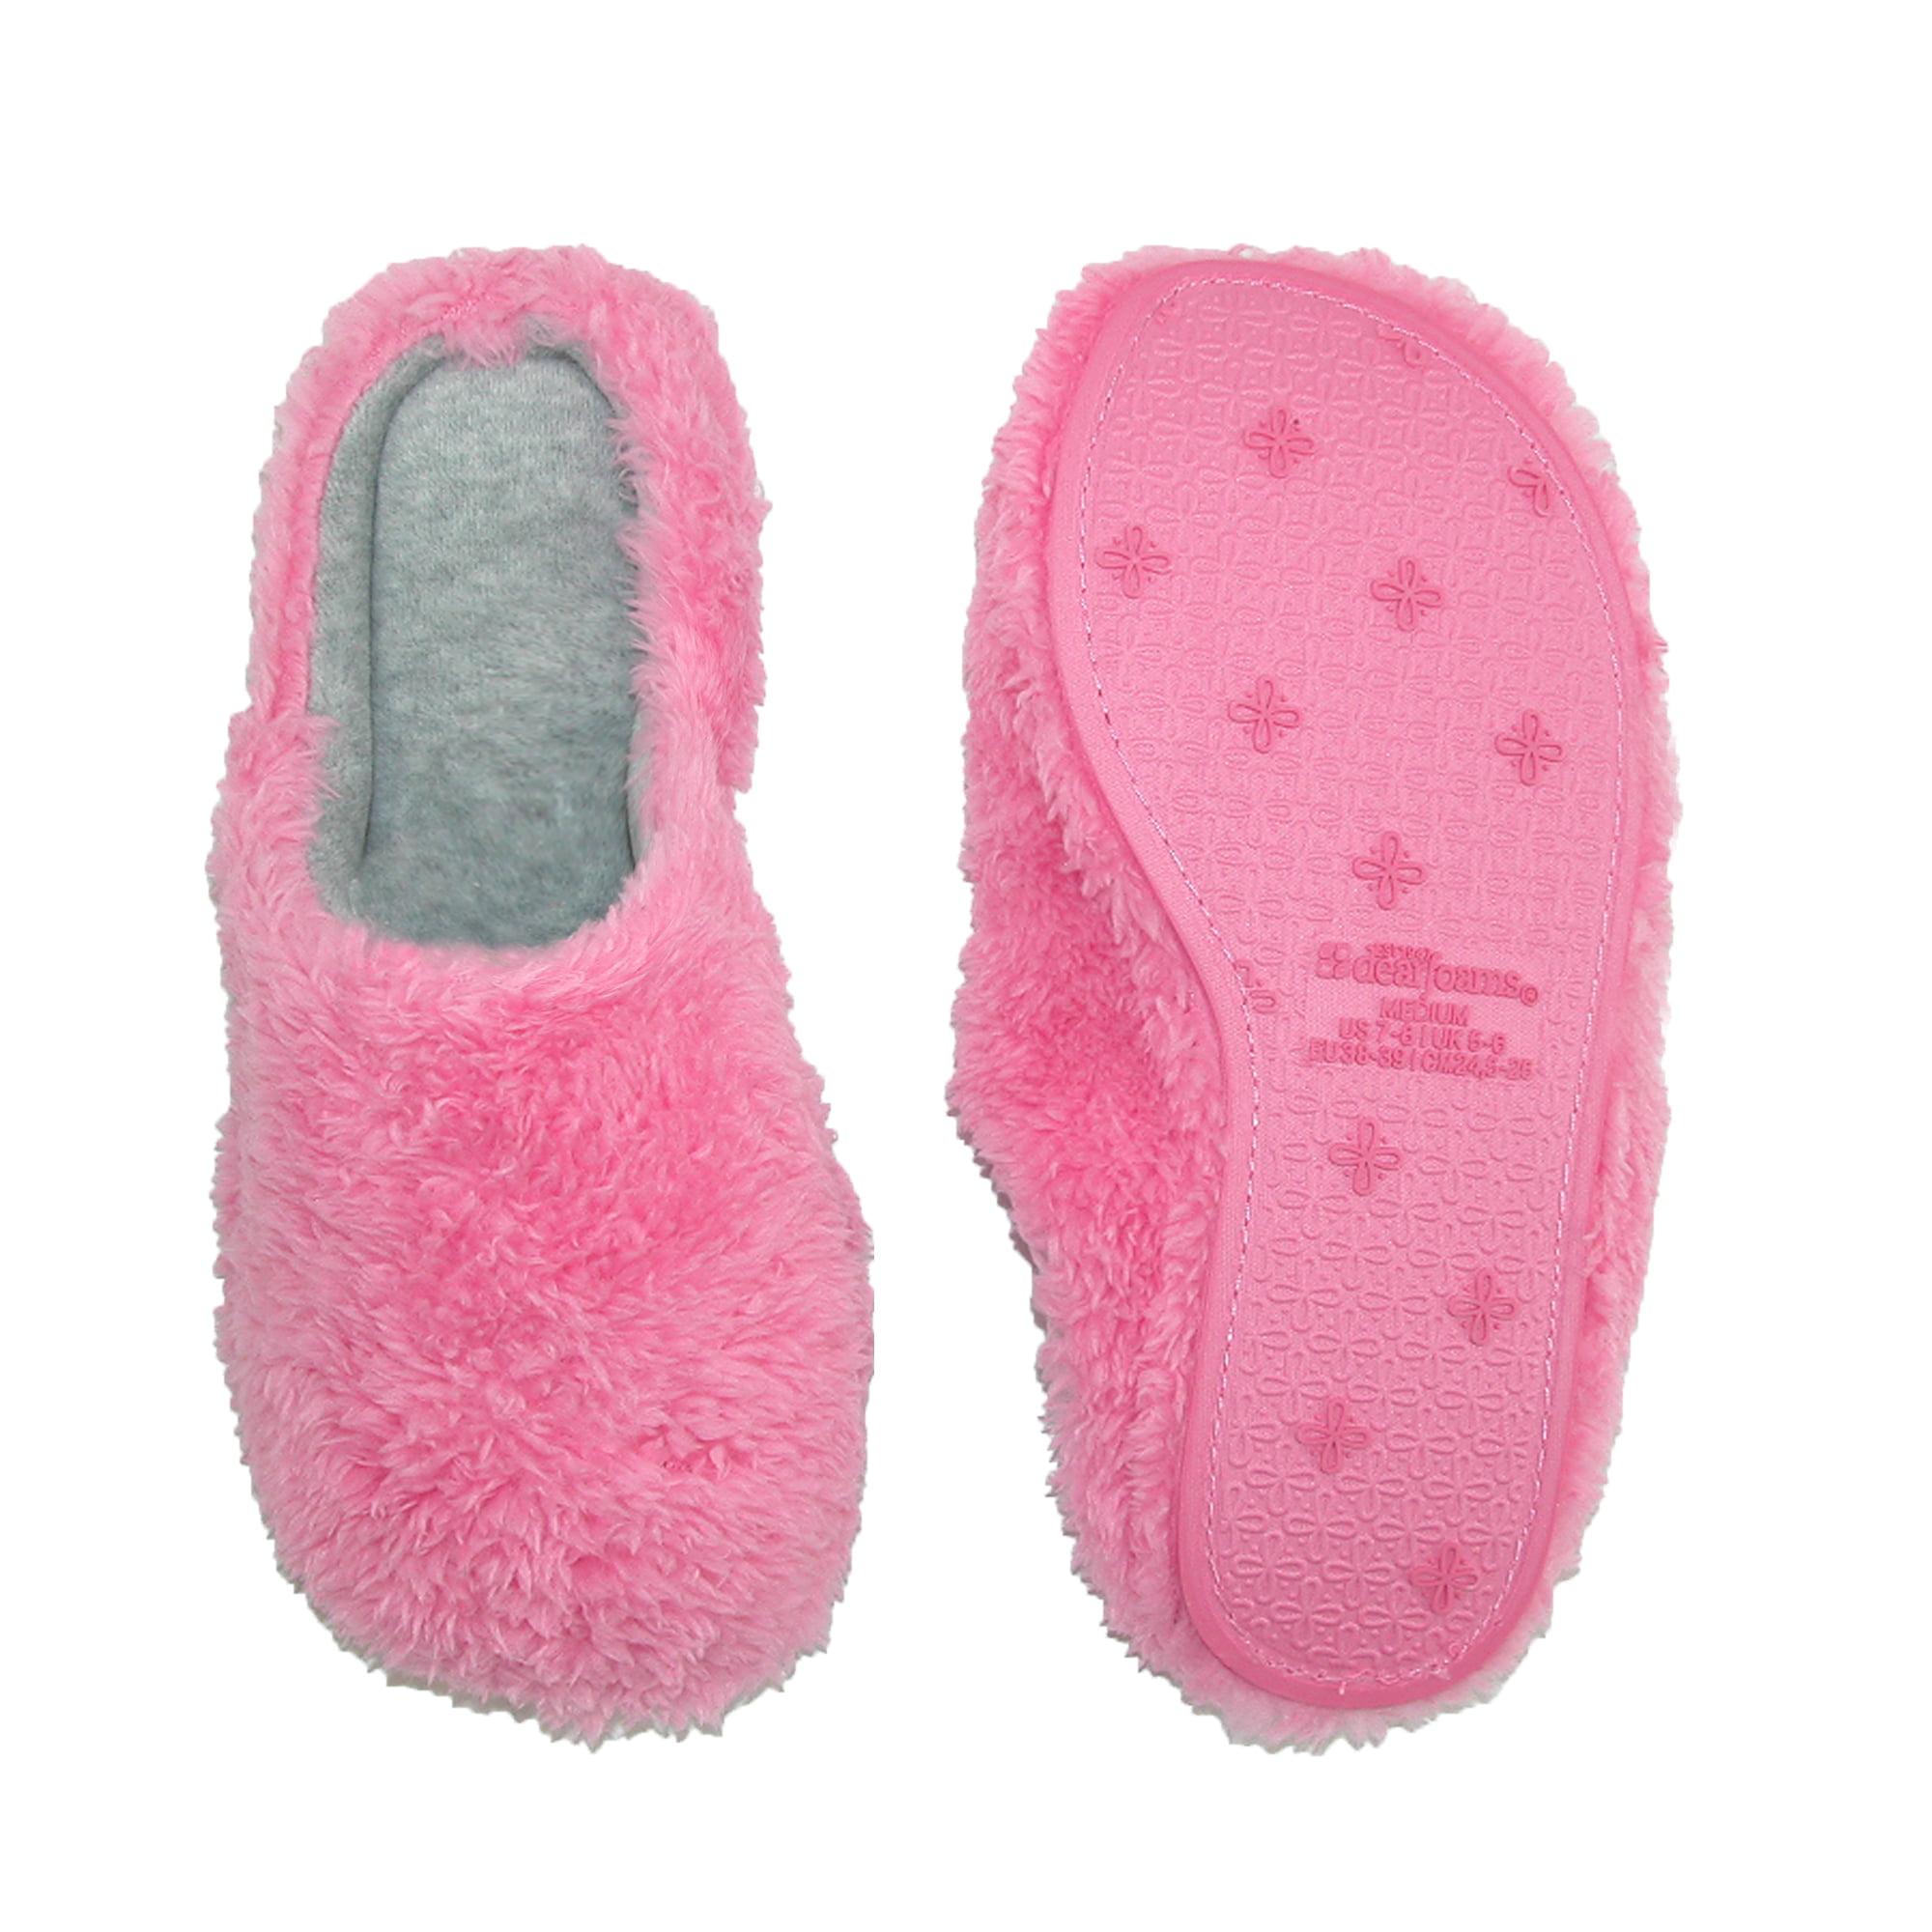 Dearfoams Bedroom Slippers ~ cryp.us